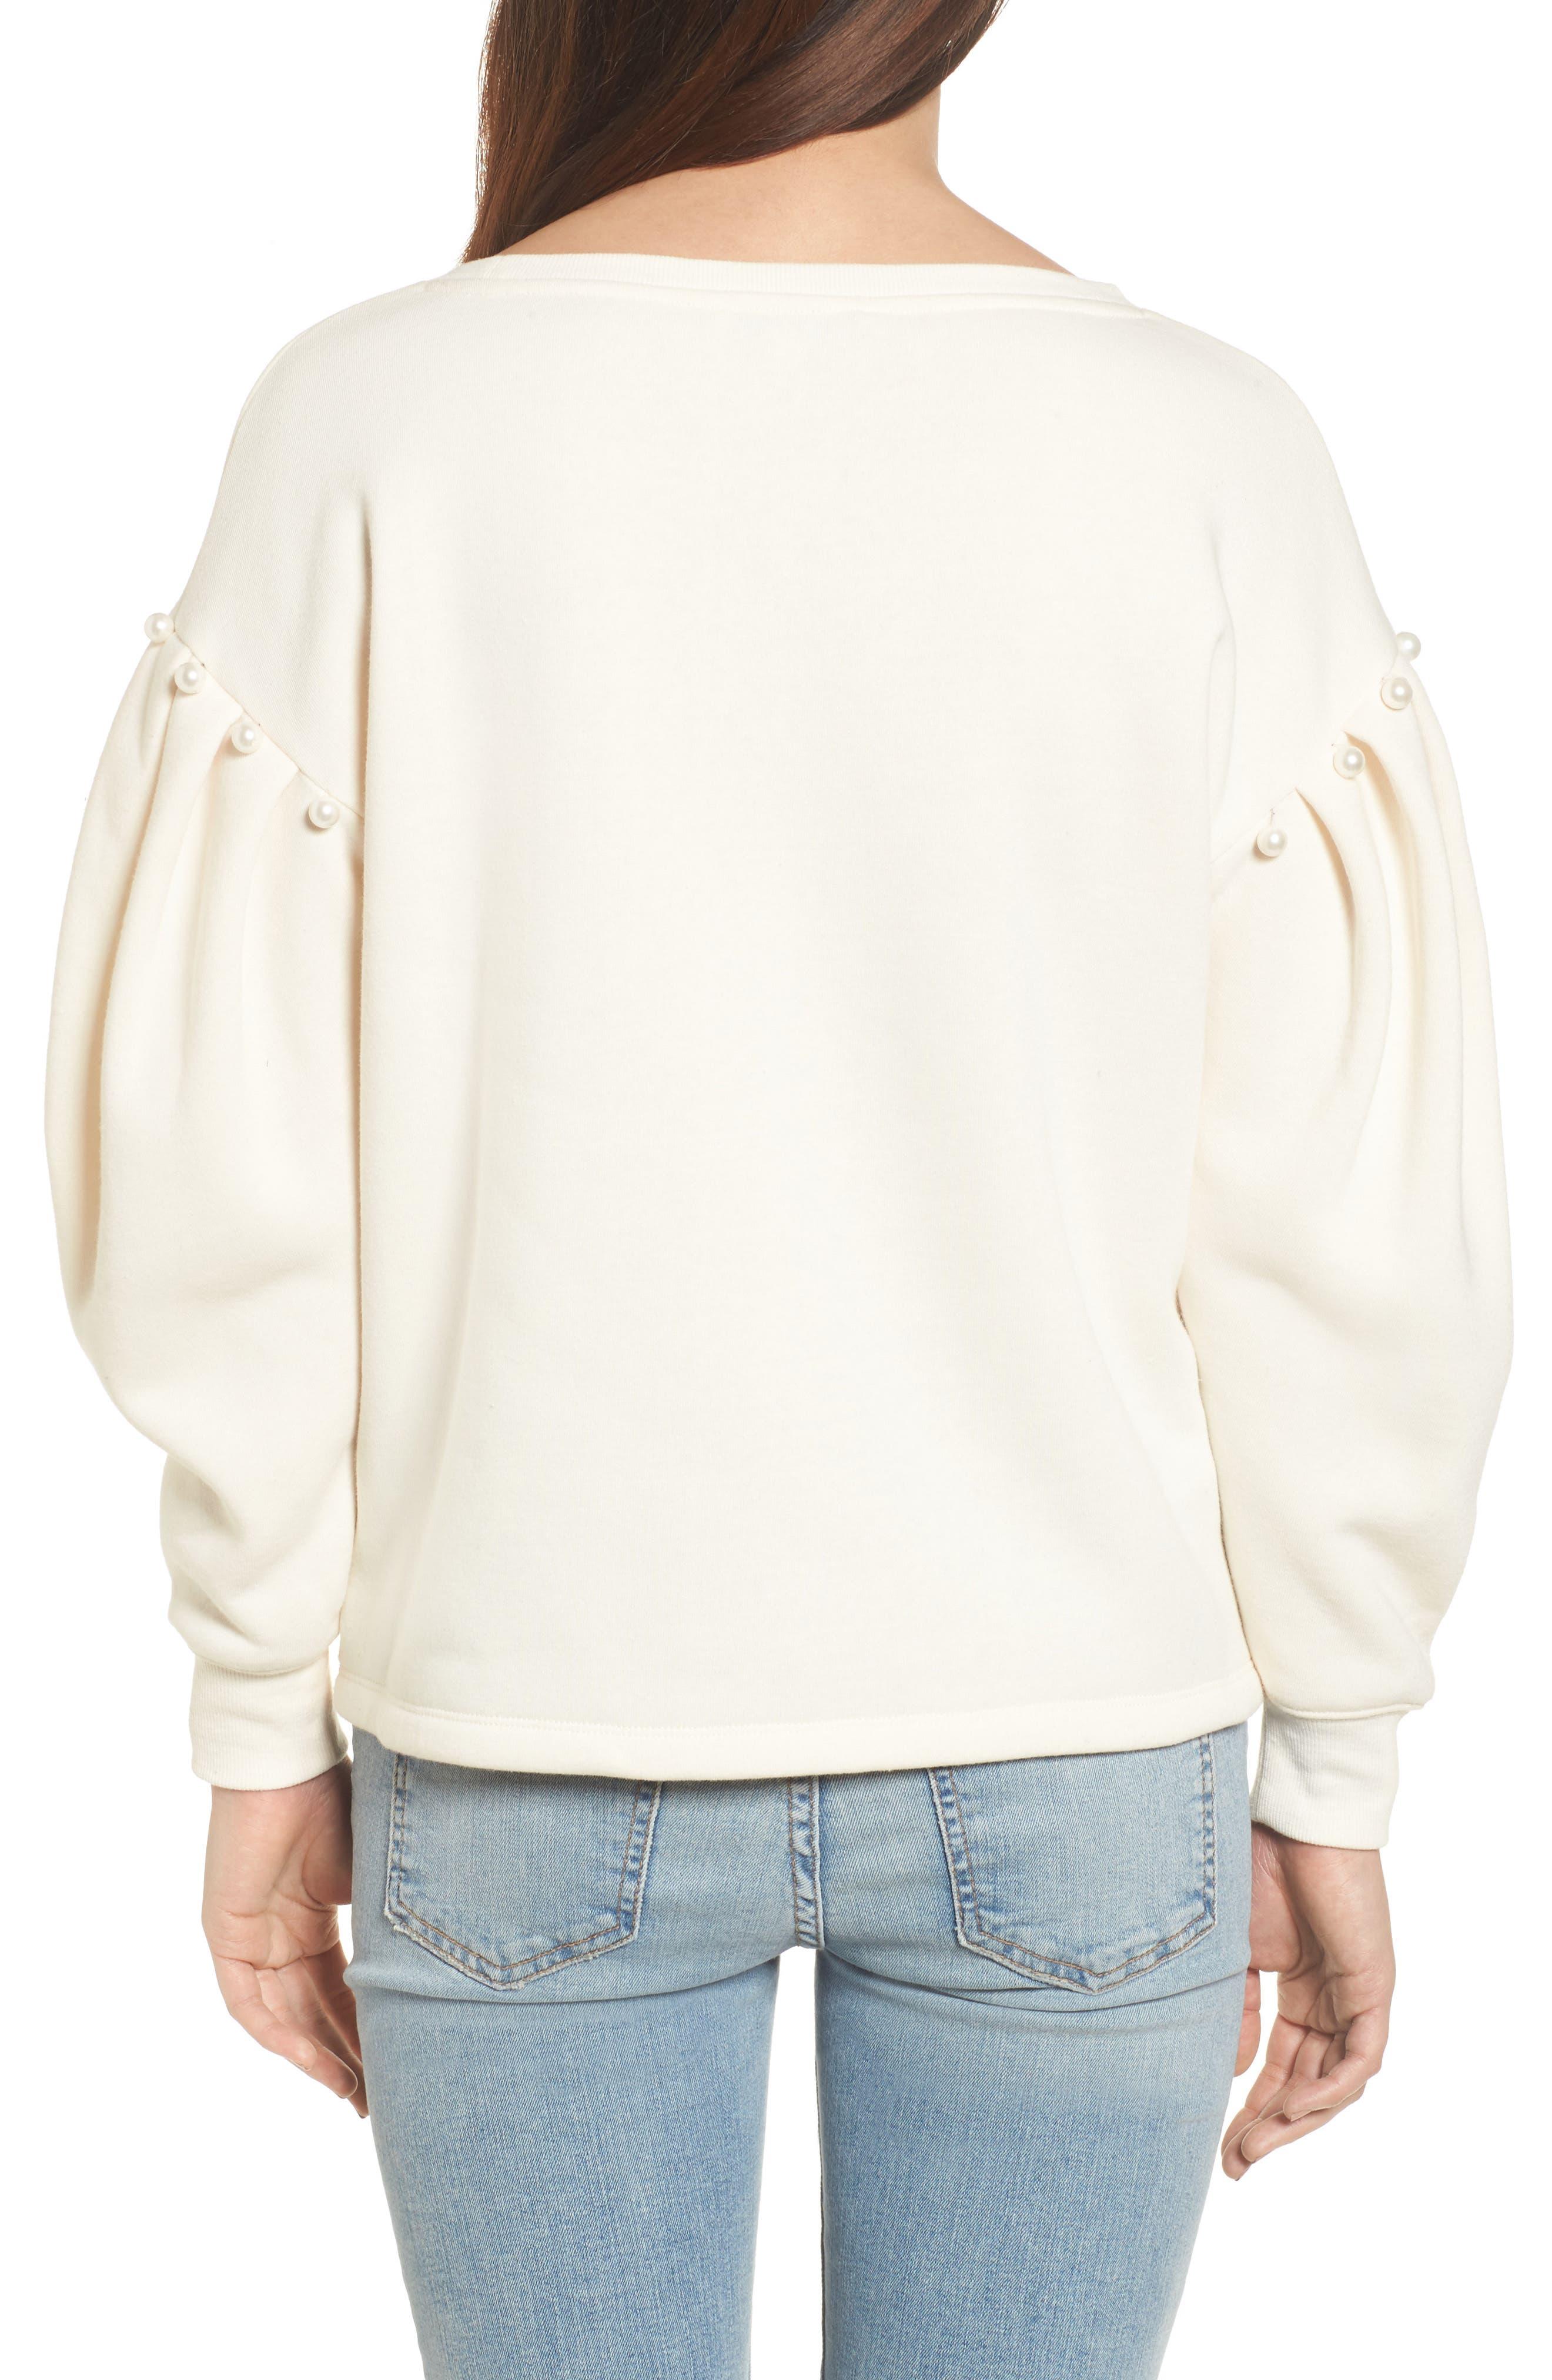 Ellison Sweatshirt,                             Alternate thumbnail 2, color,                             Off White